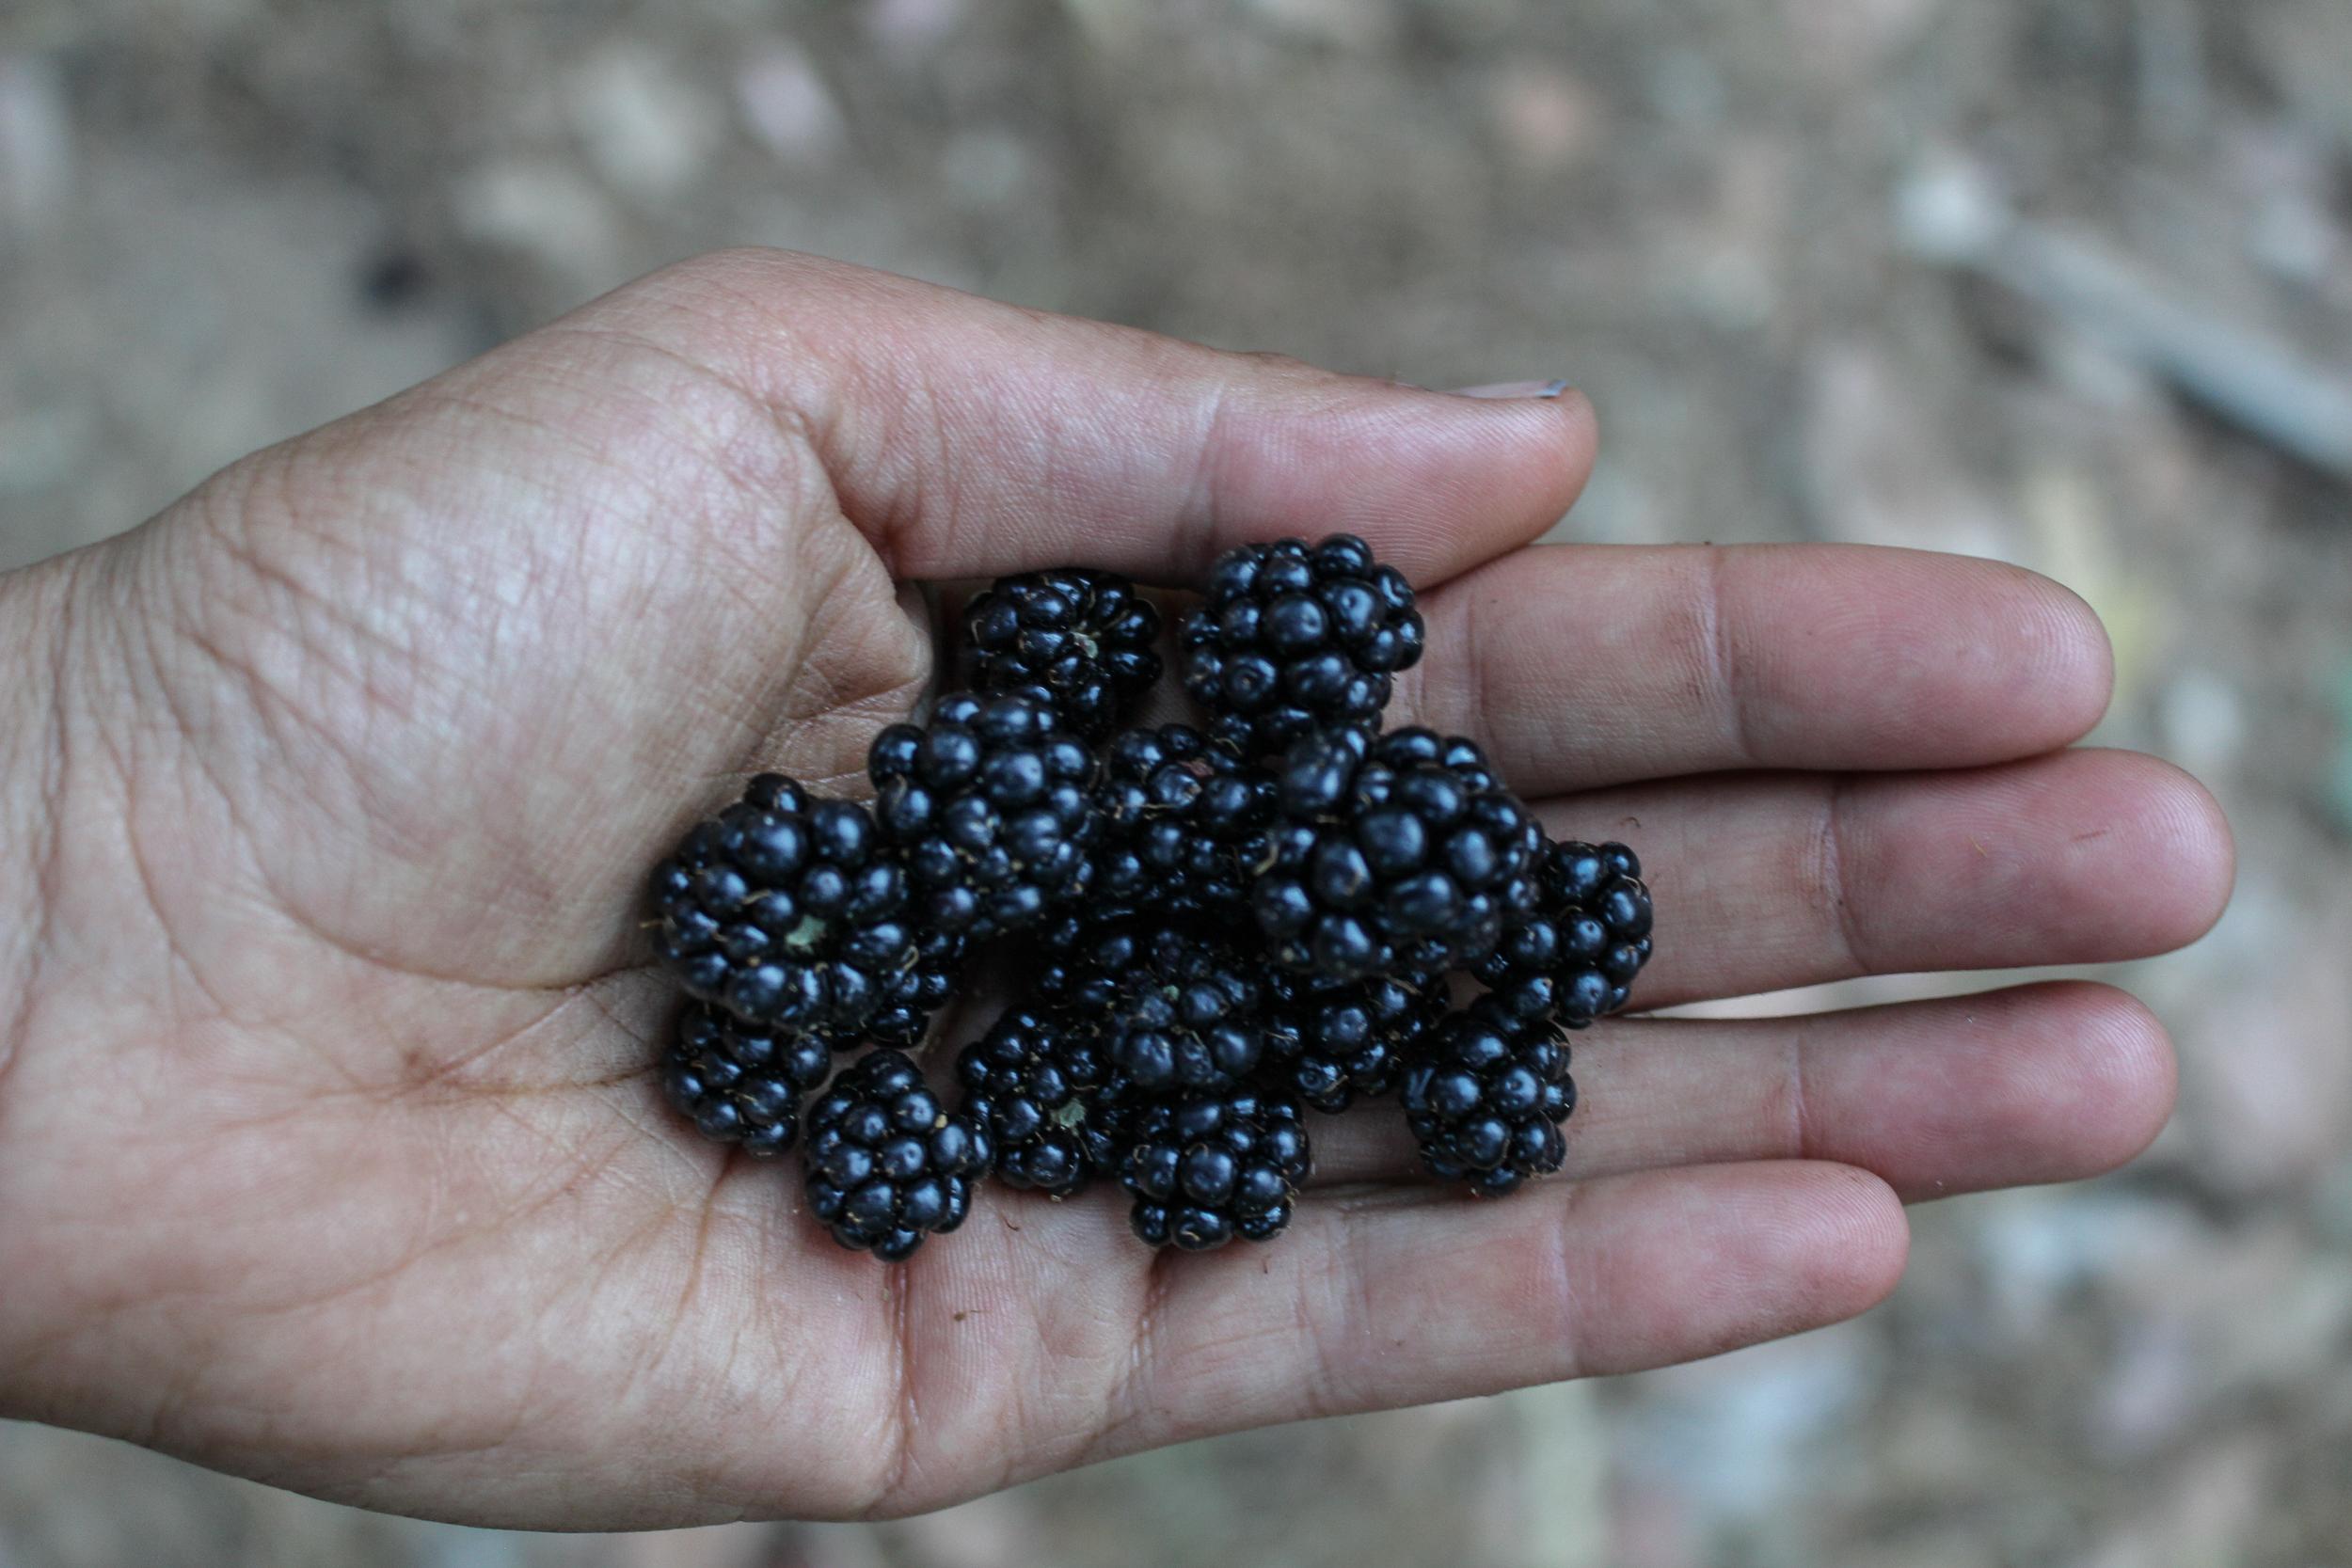 travel photography blog california wildberries alyssa ackerman hipcamp